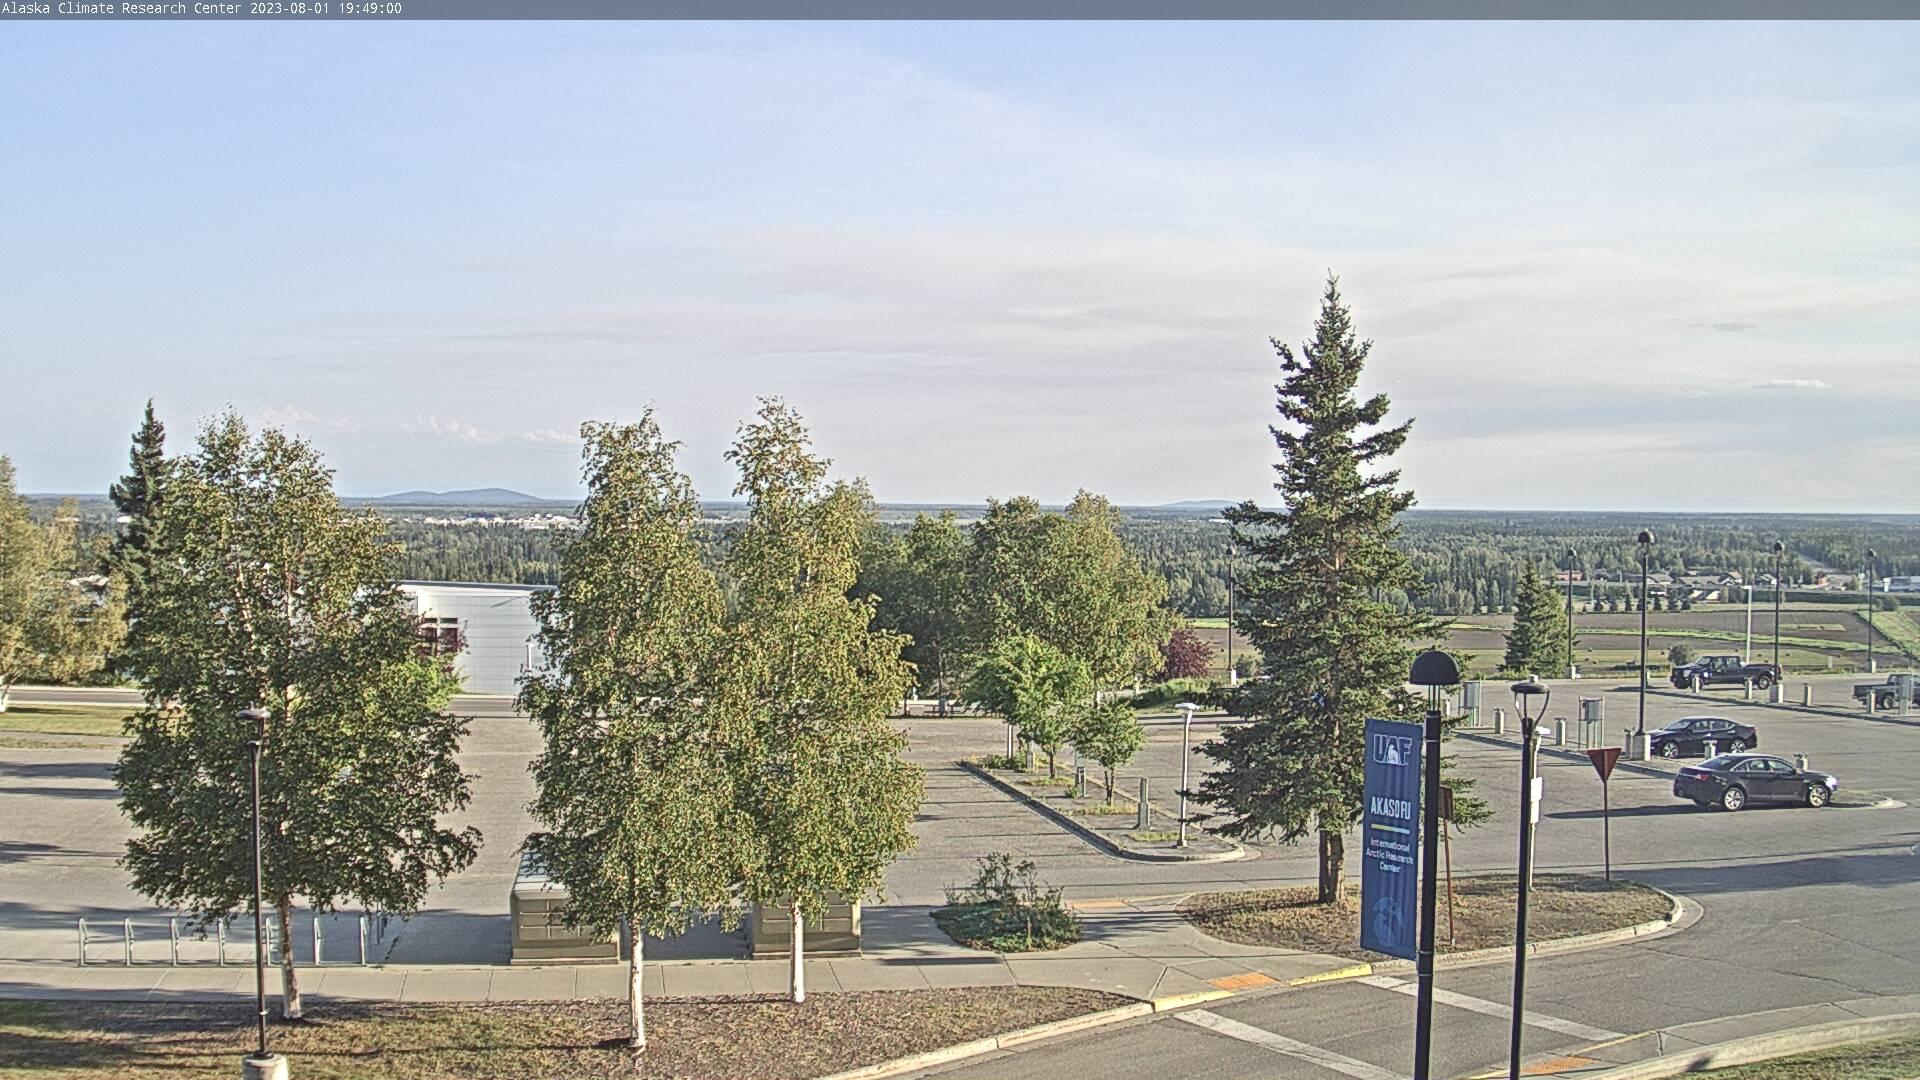 webcam Fairbanks